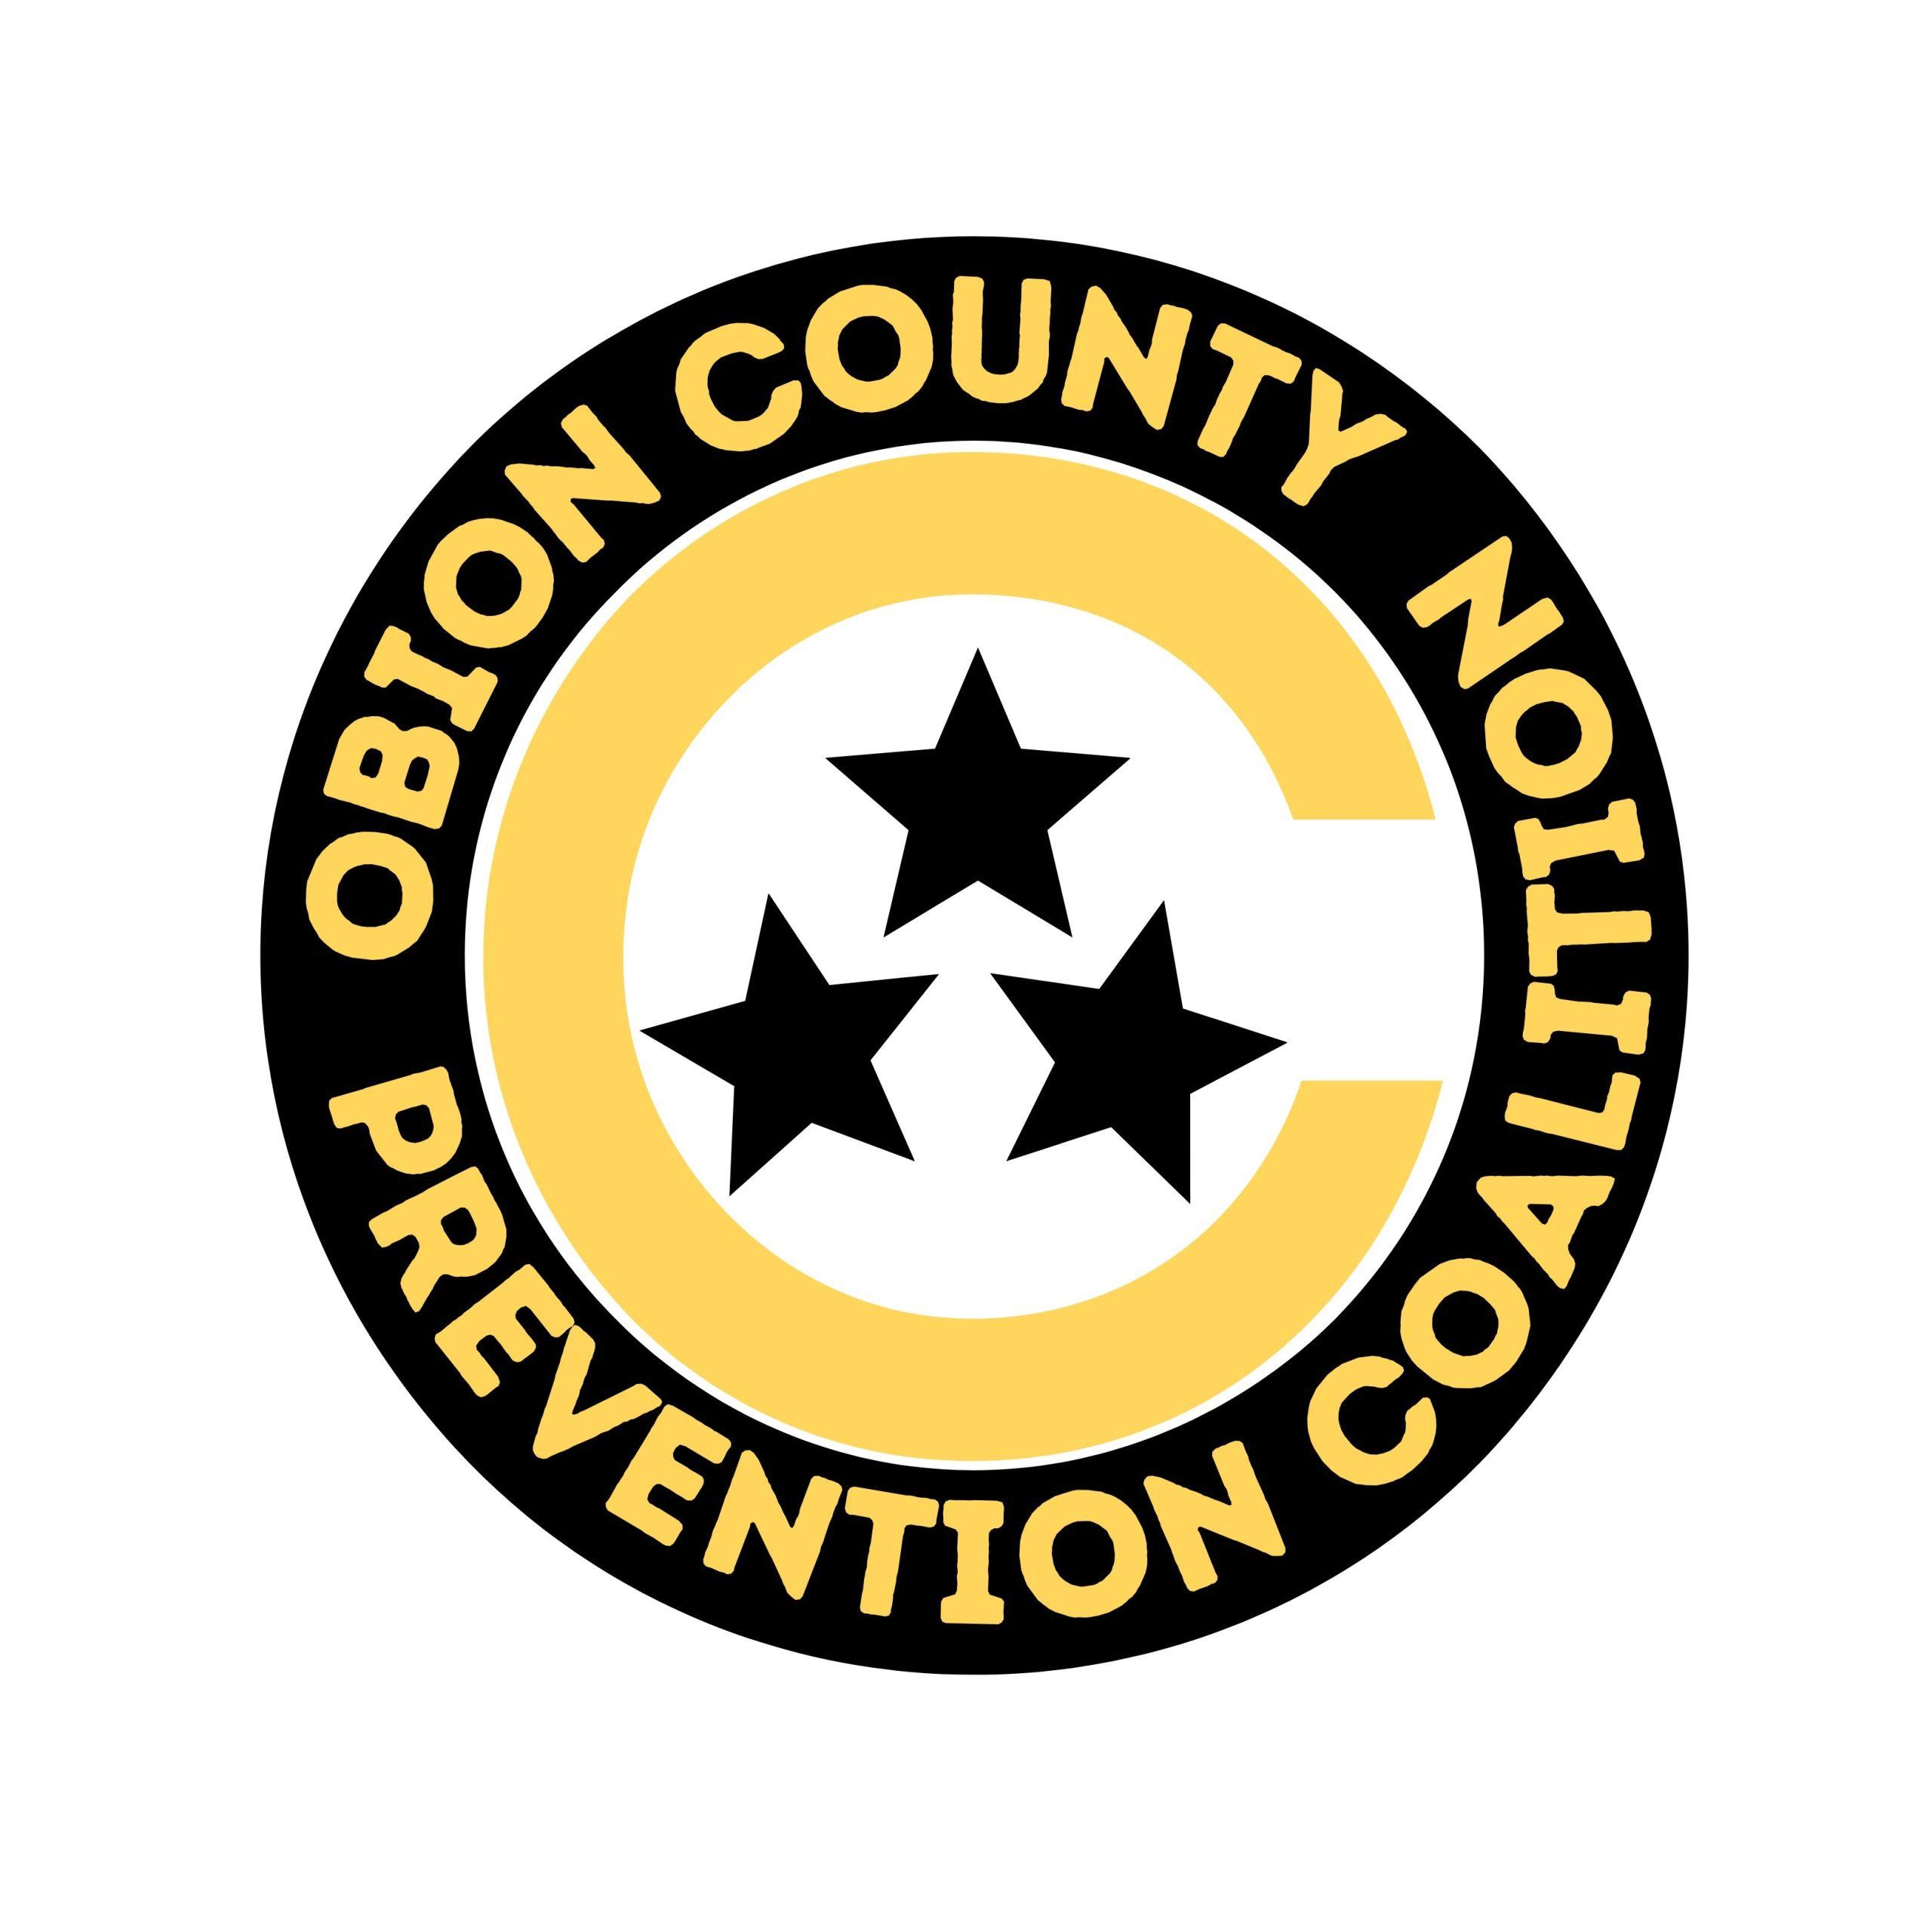 Obion County Prevention Coalition